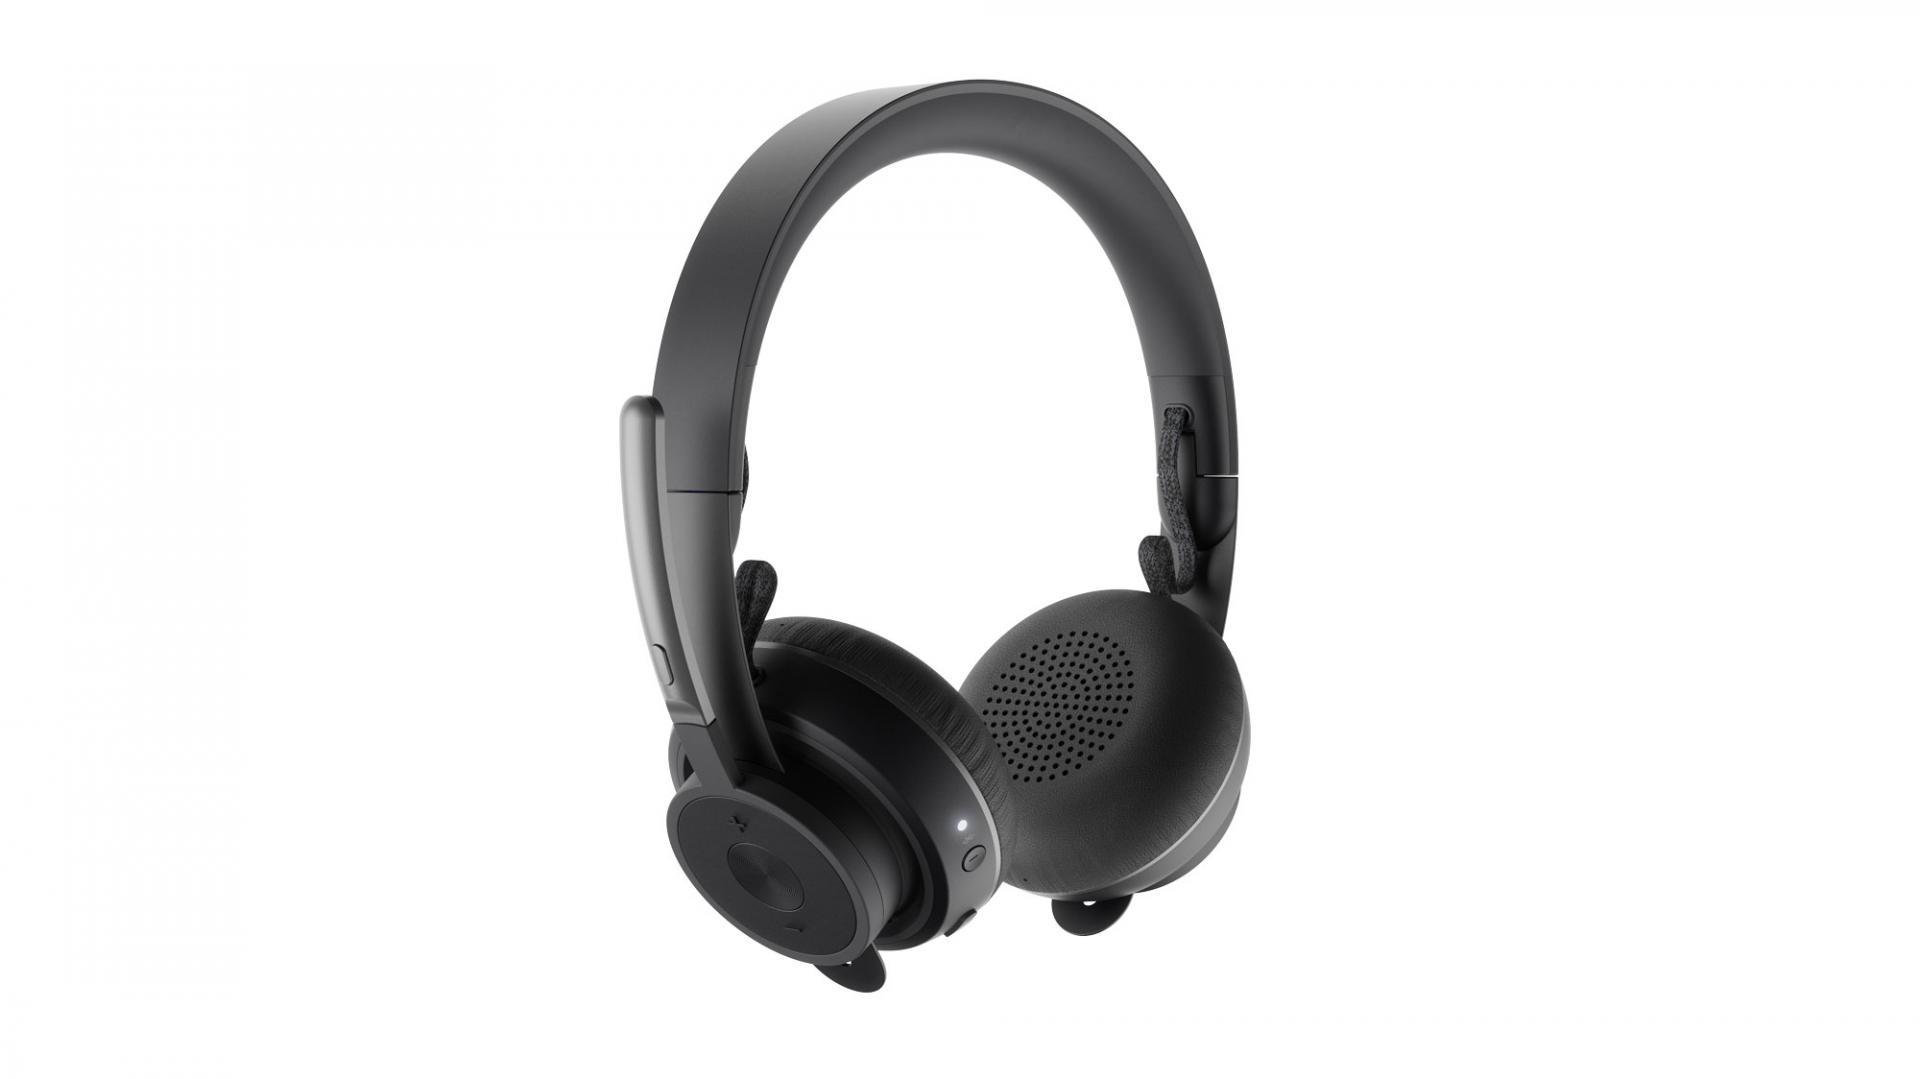 Logitech предлагает гарнитуры для прослушивания музыки вофисе: Zone Wireless иZone Wireless Plus